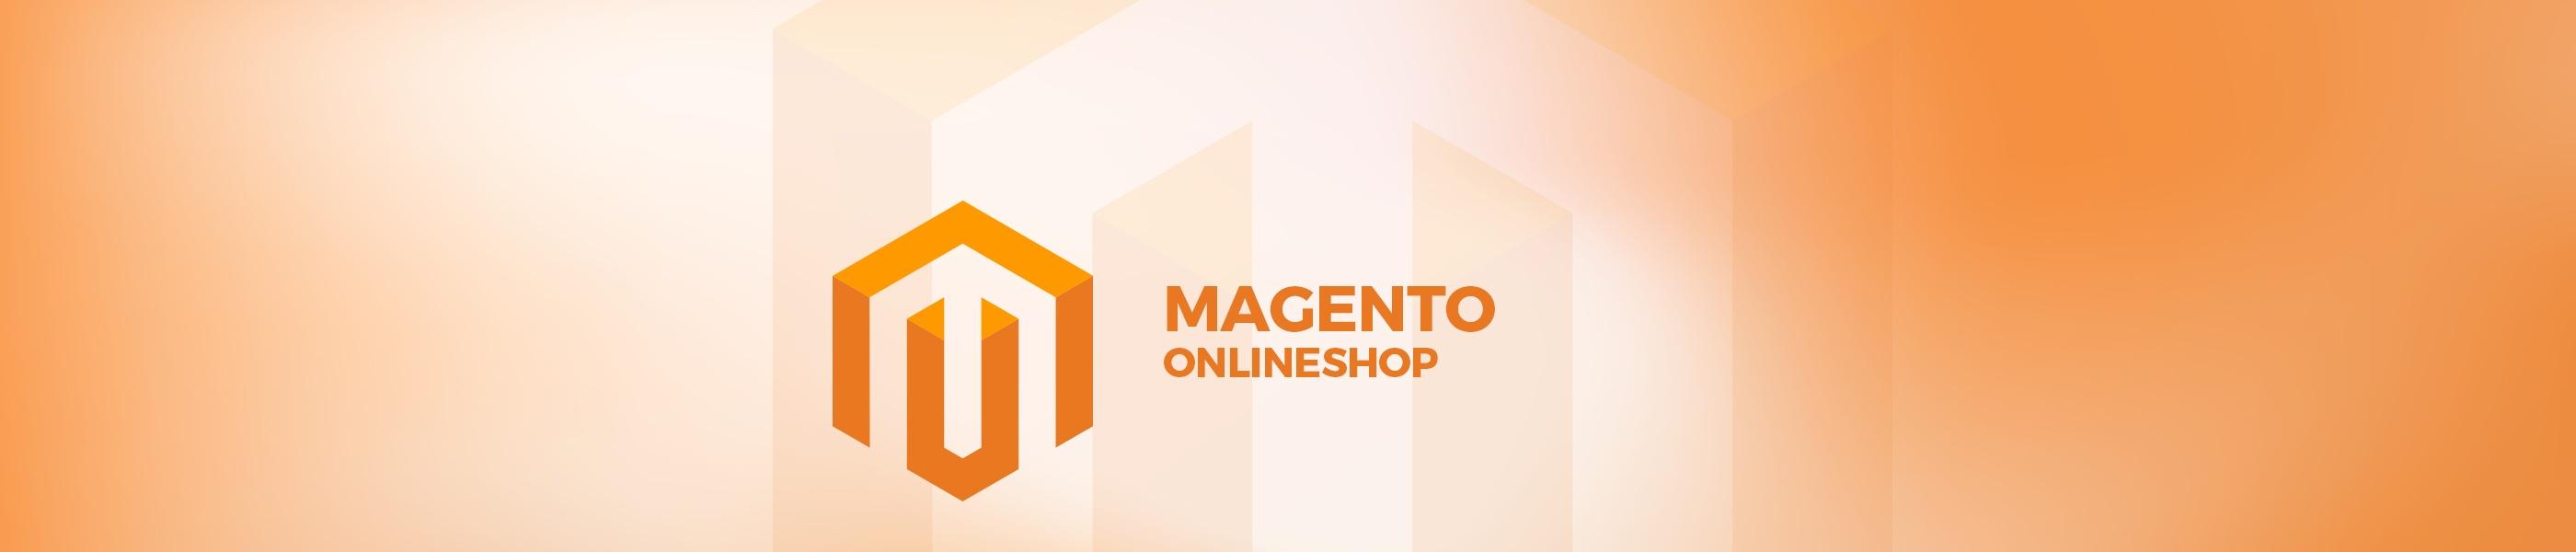 180108_Produkte_Magento.jpg